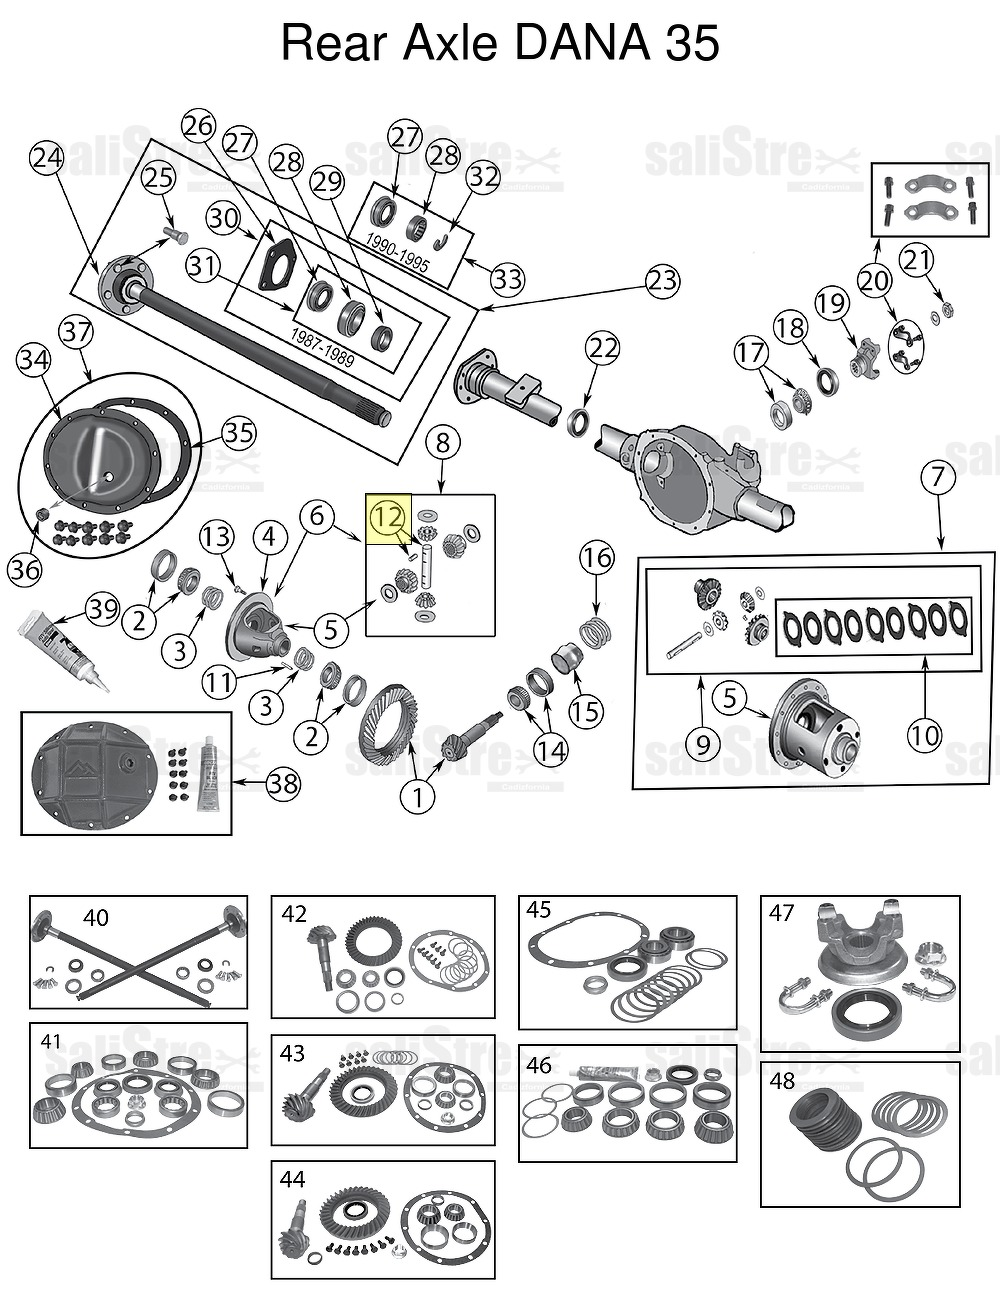 Kit Pin Y Eje Diferencial  Trasero Jeep Wrangler Yj 1990